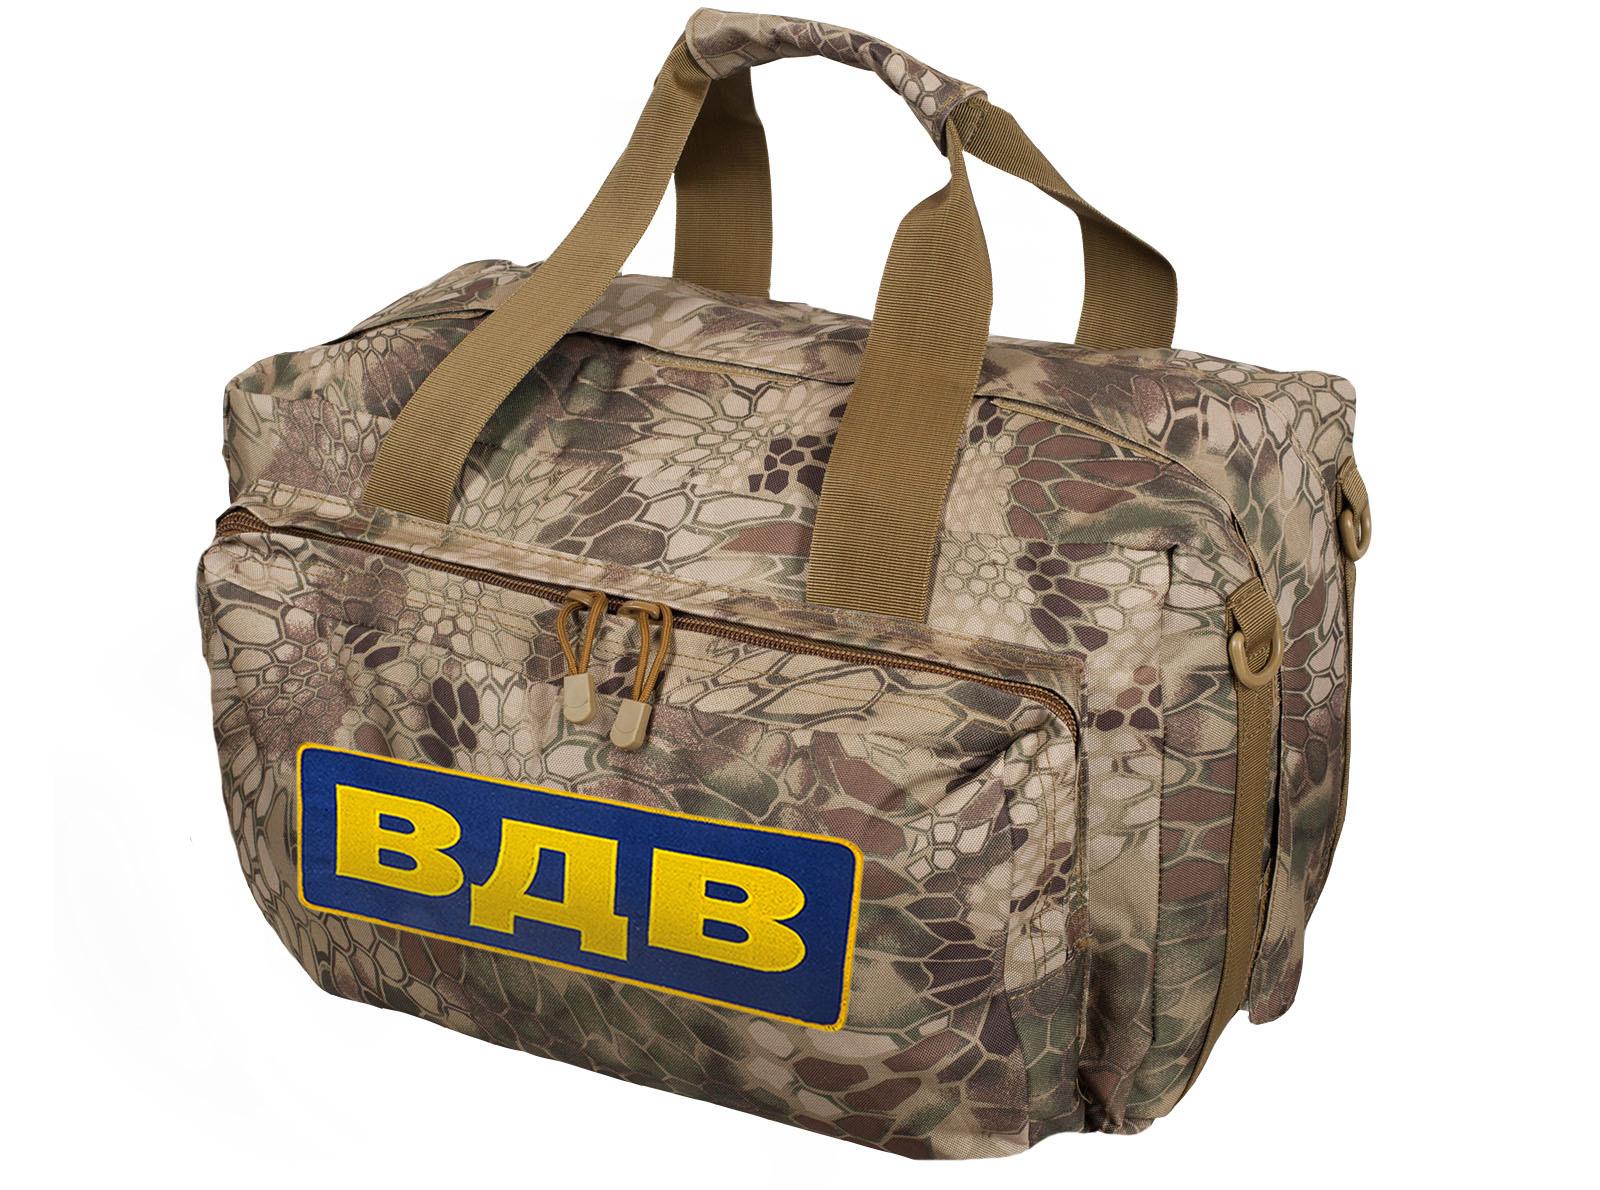 Купить в военторге Военпро сумку воздушного десанта